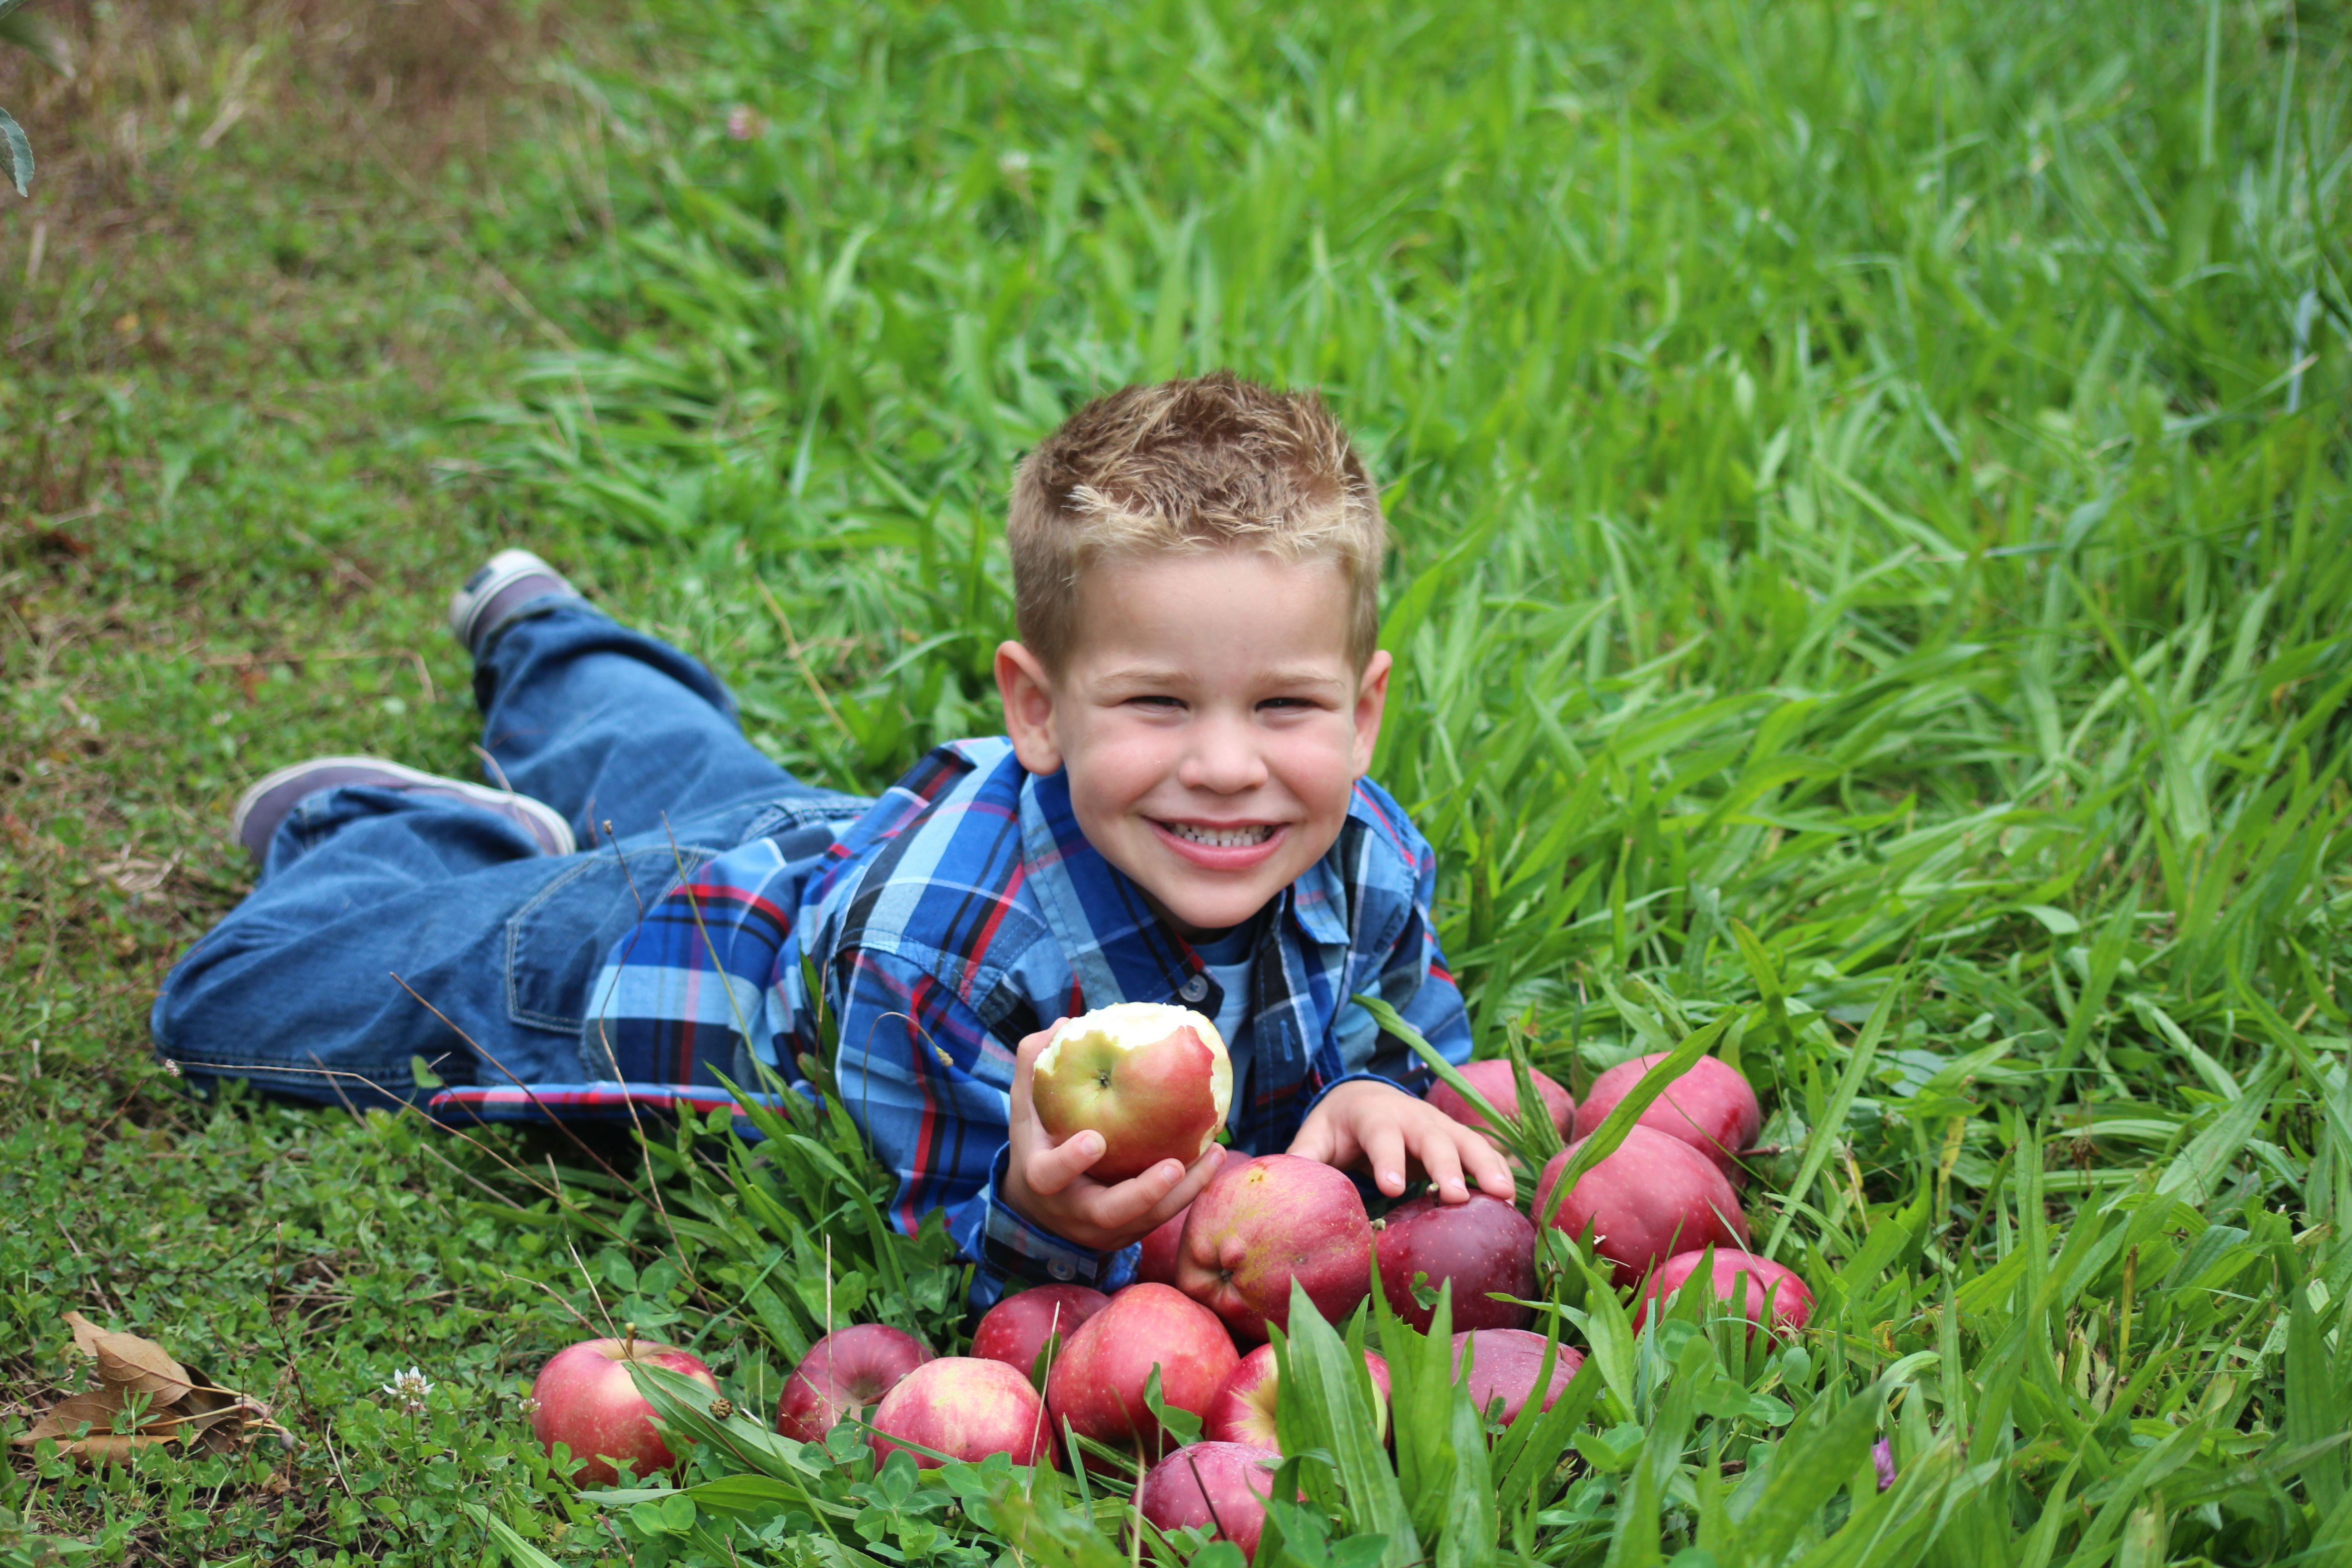 Collin Apple Pickin photo by Chrissy Marie Lum